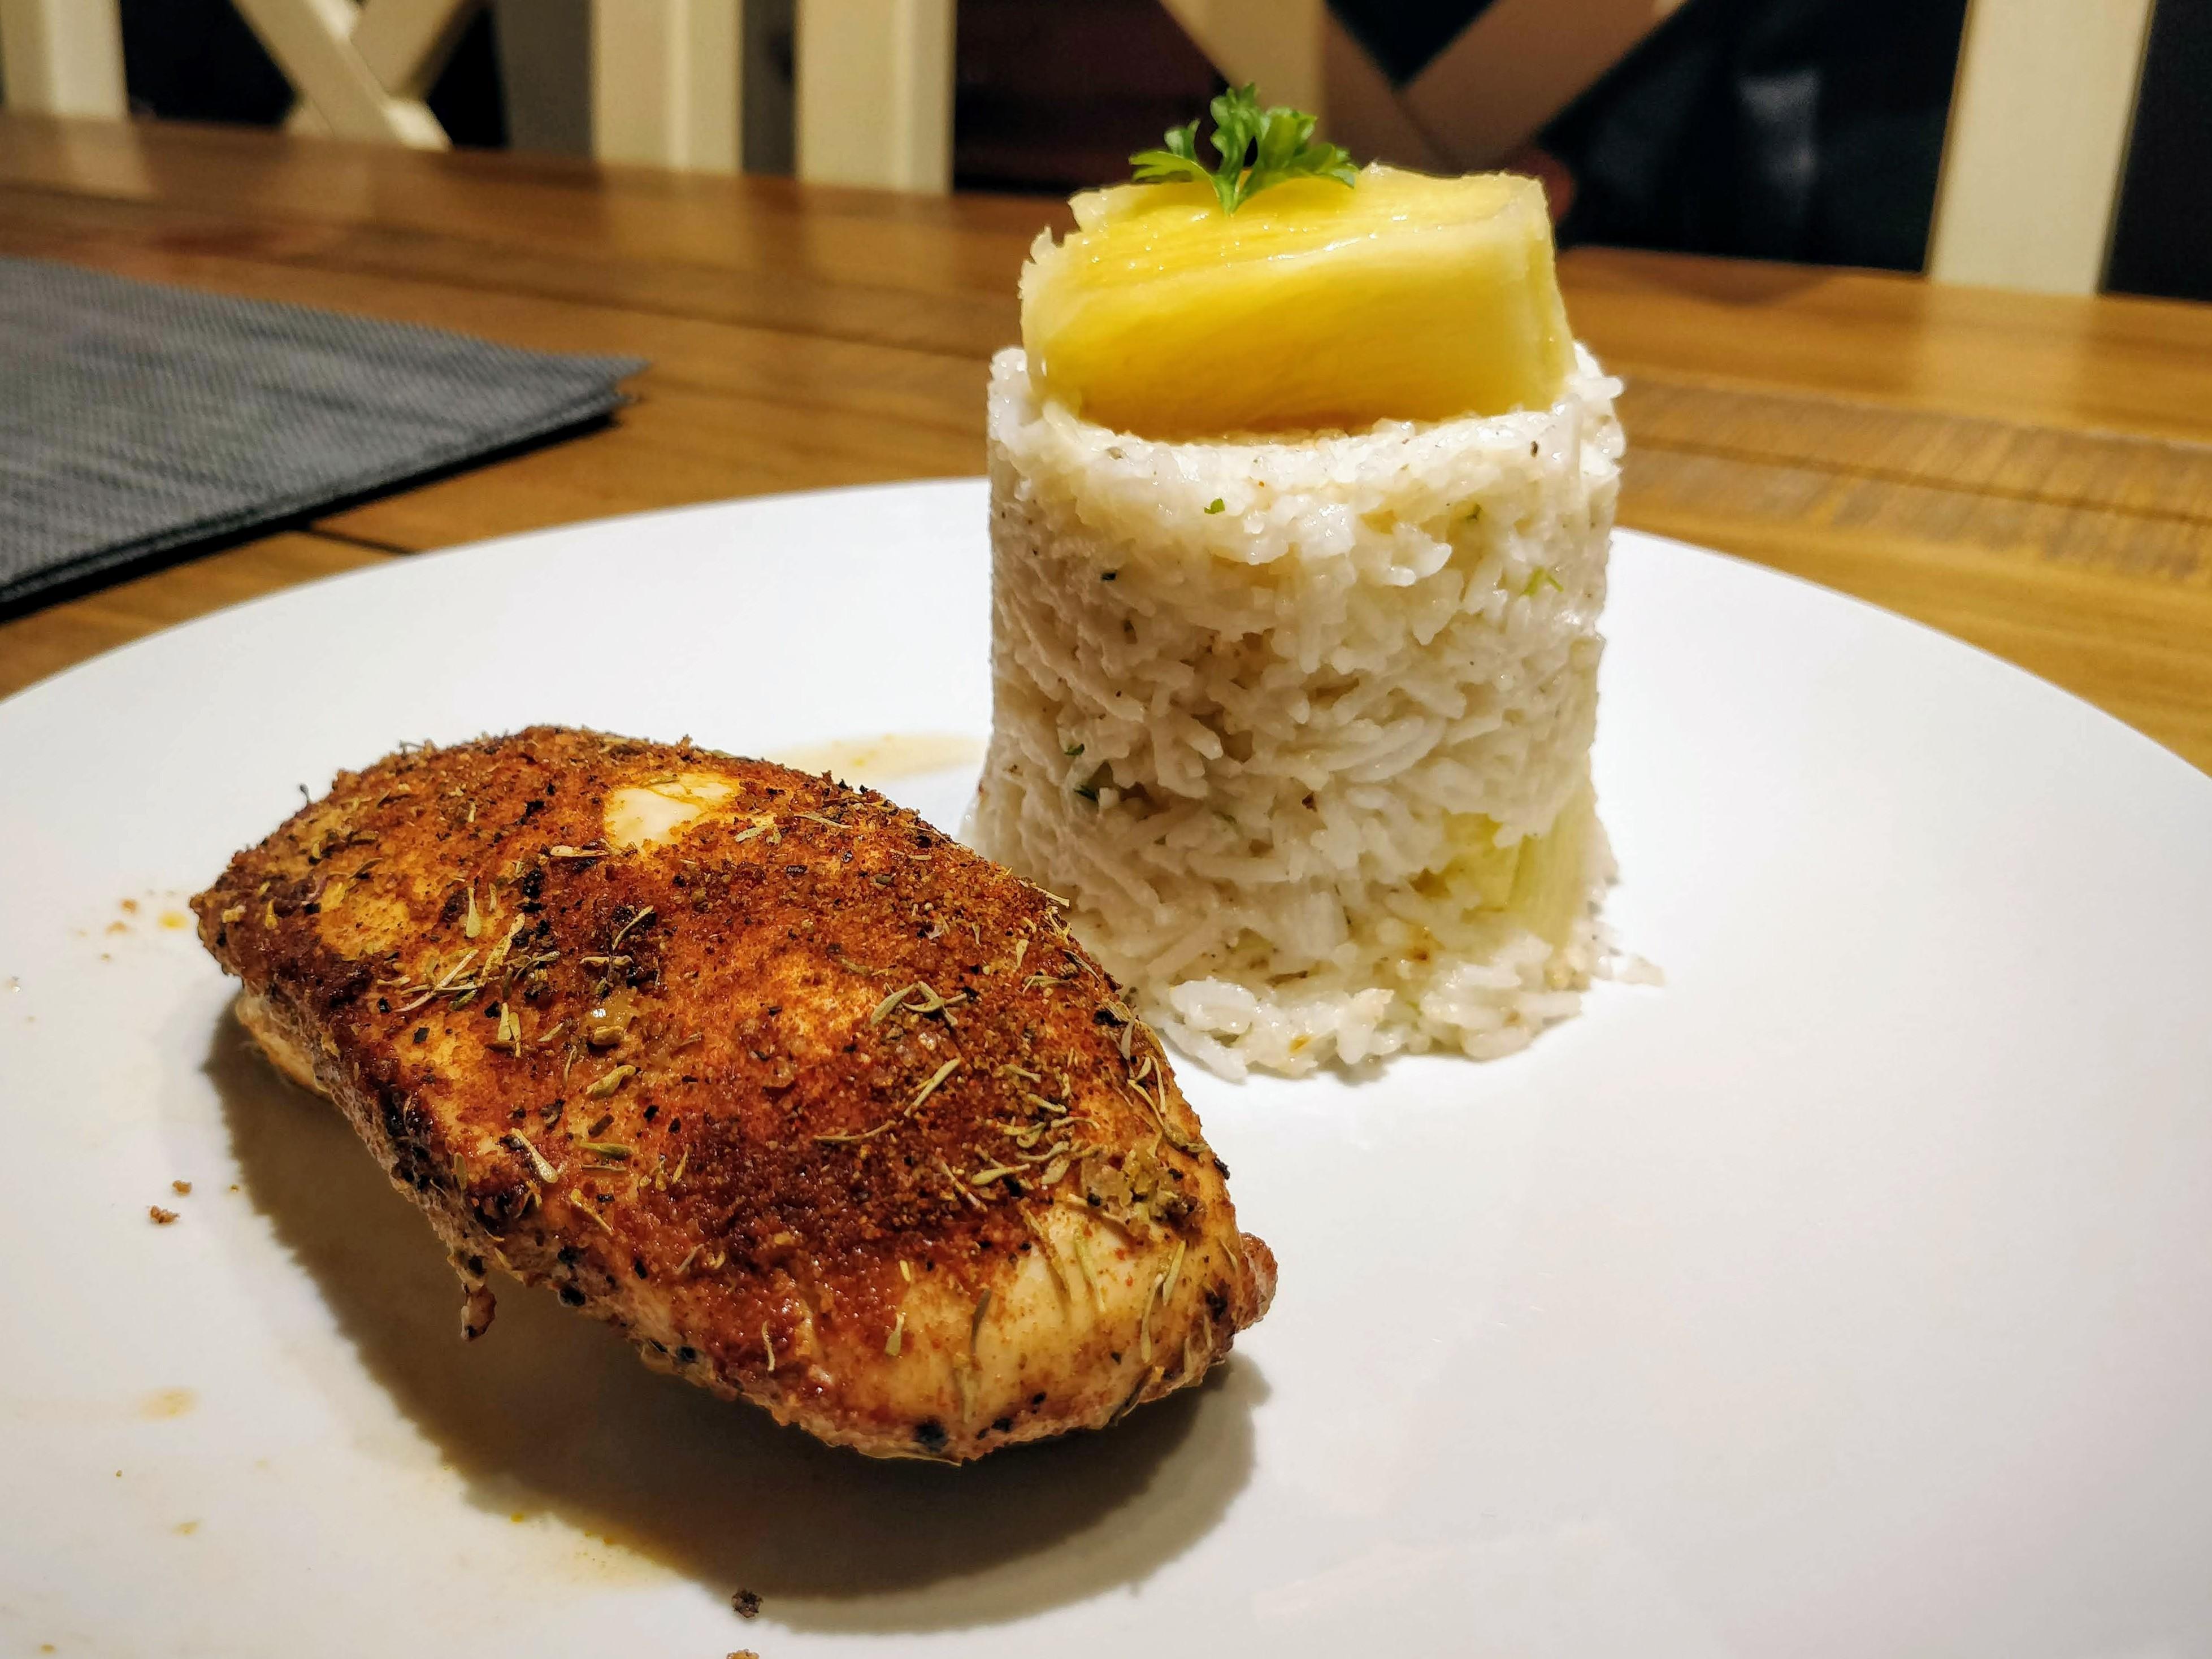 Caribbean Chicken with Pineapple-Cilantro Rice Clara Morice